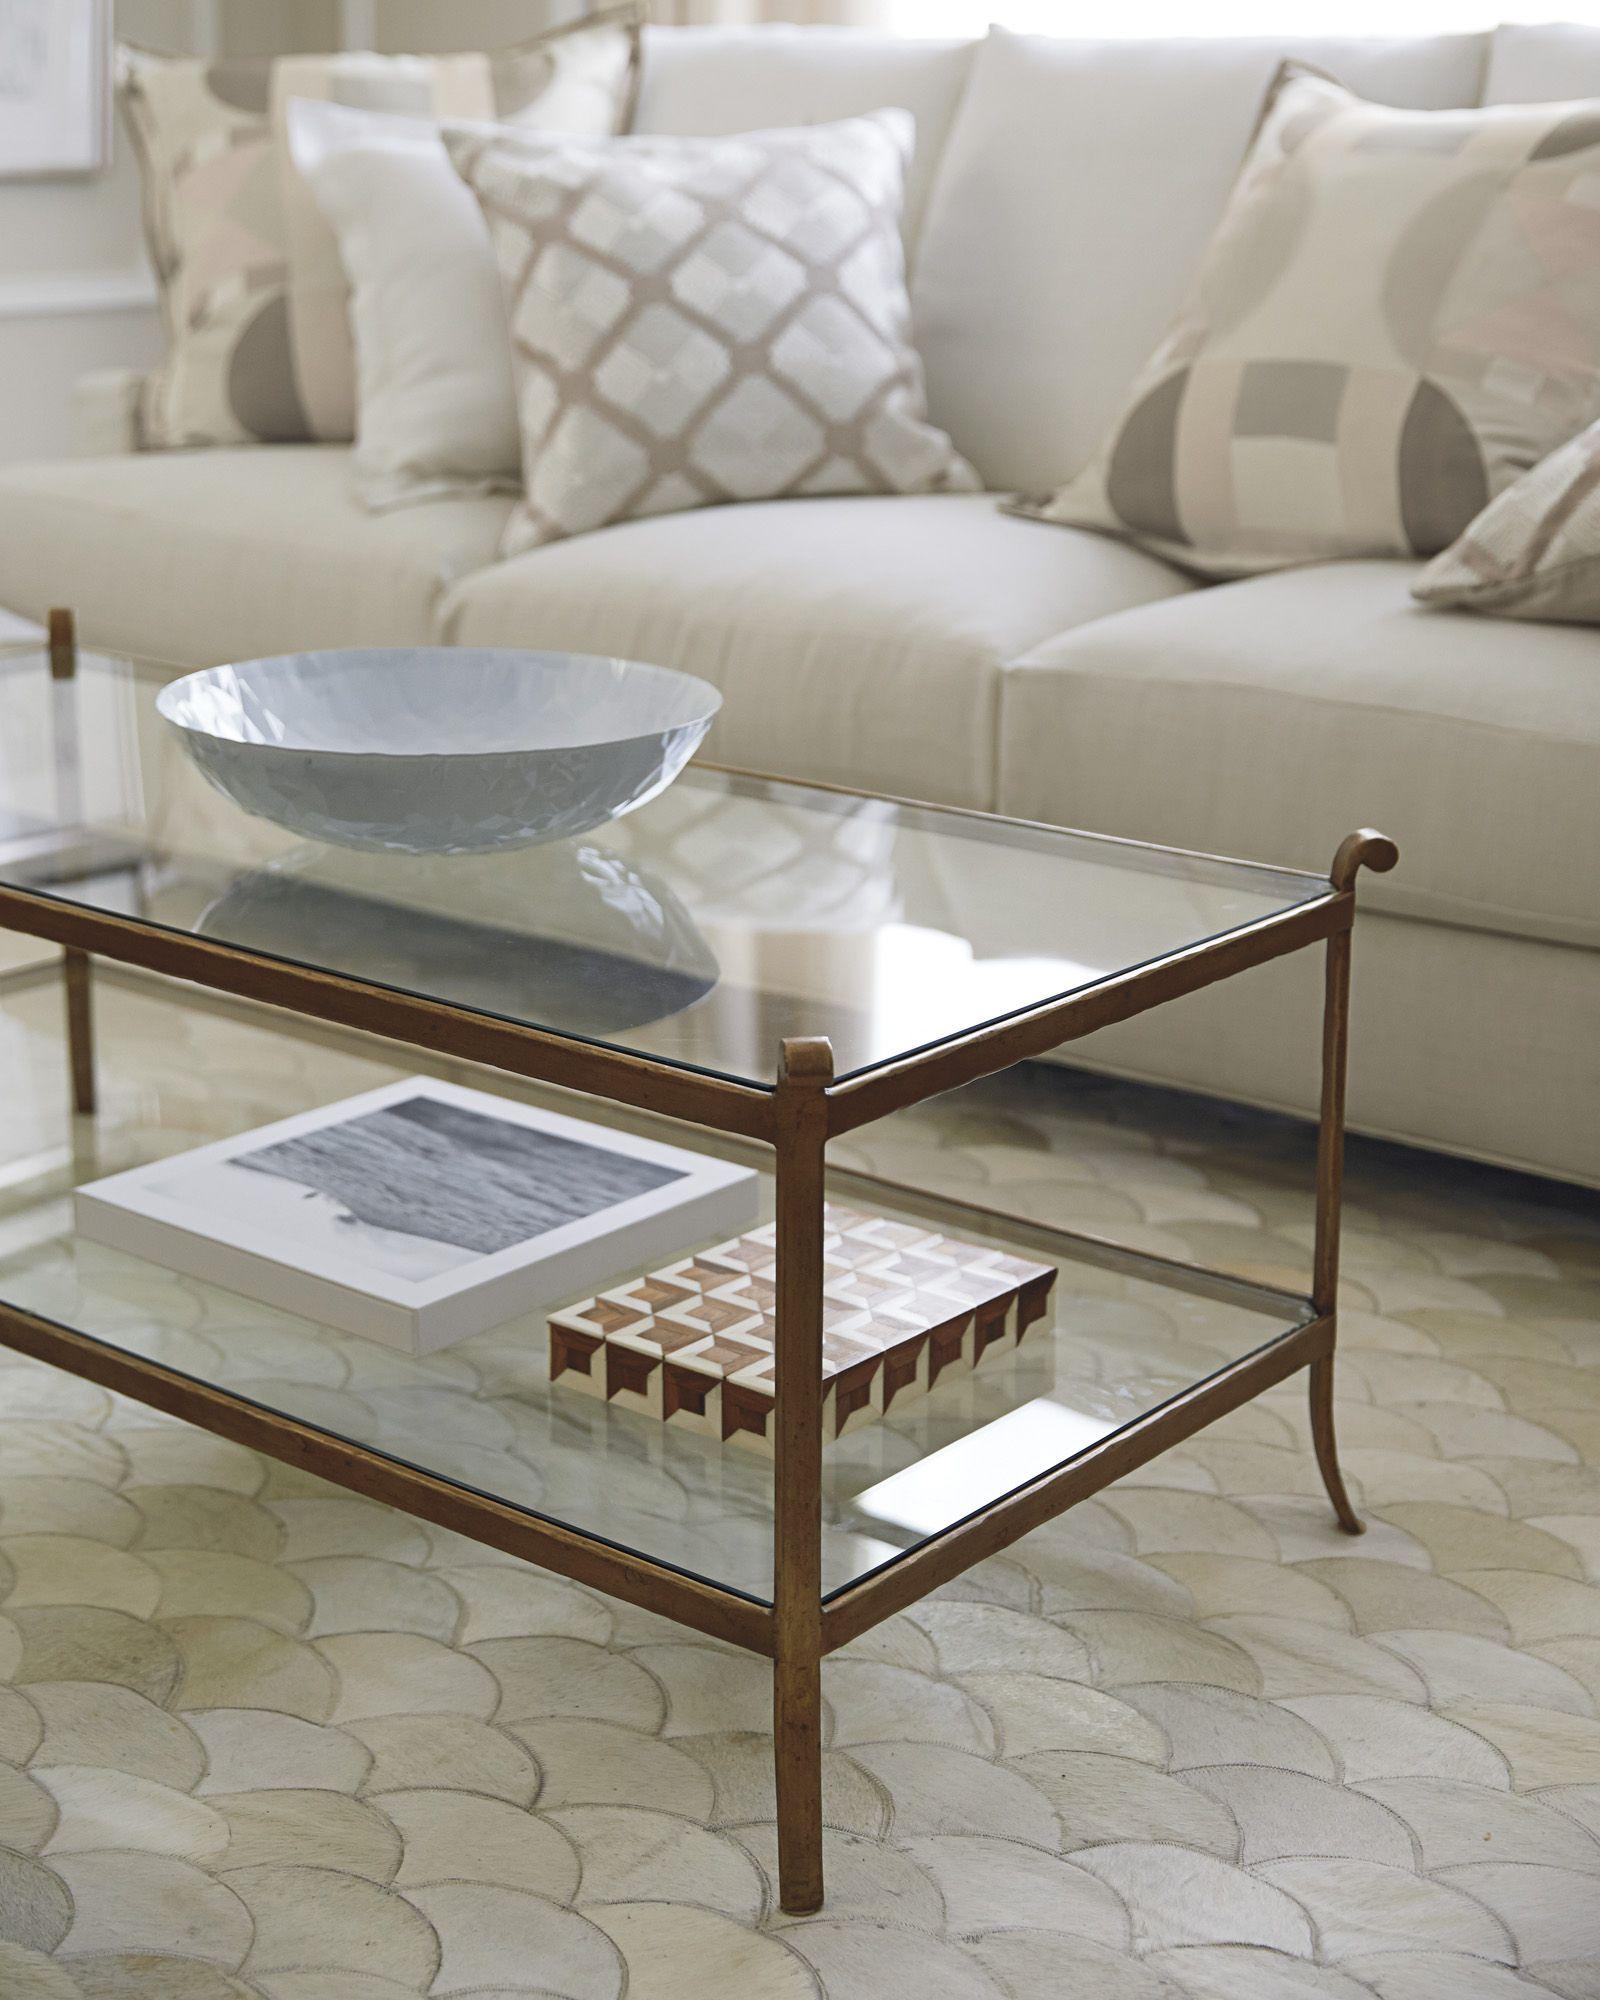 St Germain Glass Coffee Table Coffee Table Living Room Coffee Table Living Room Carpet [ 2000 x 1600 Pixel ]